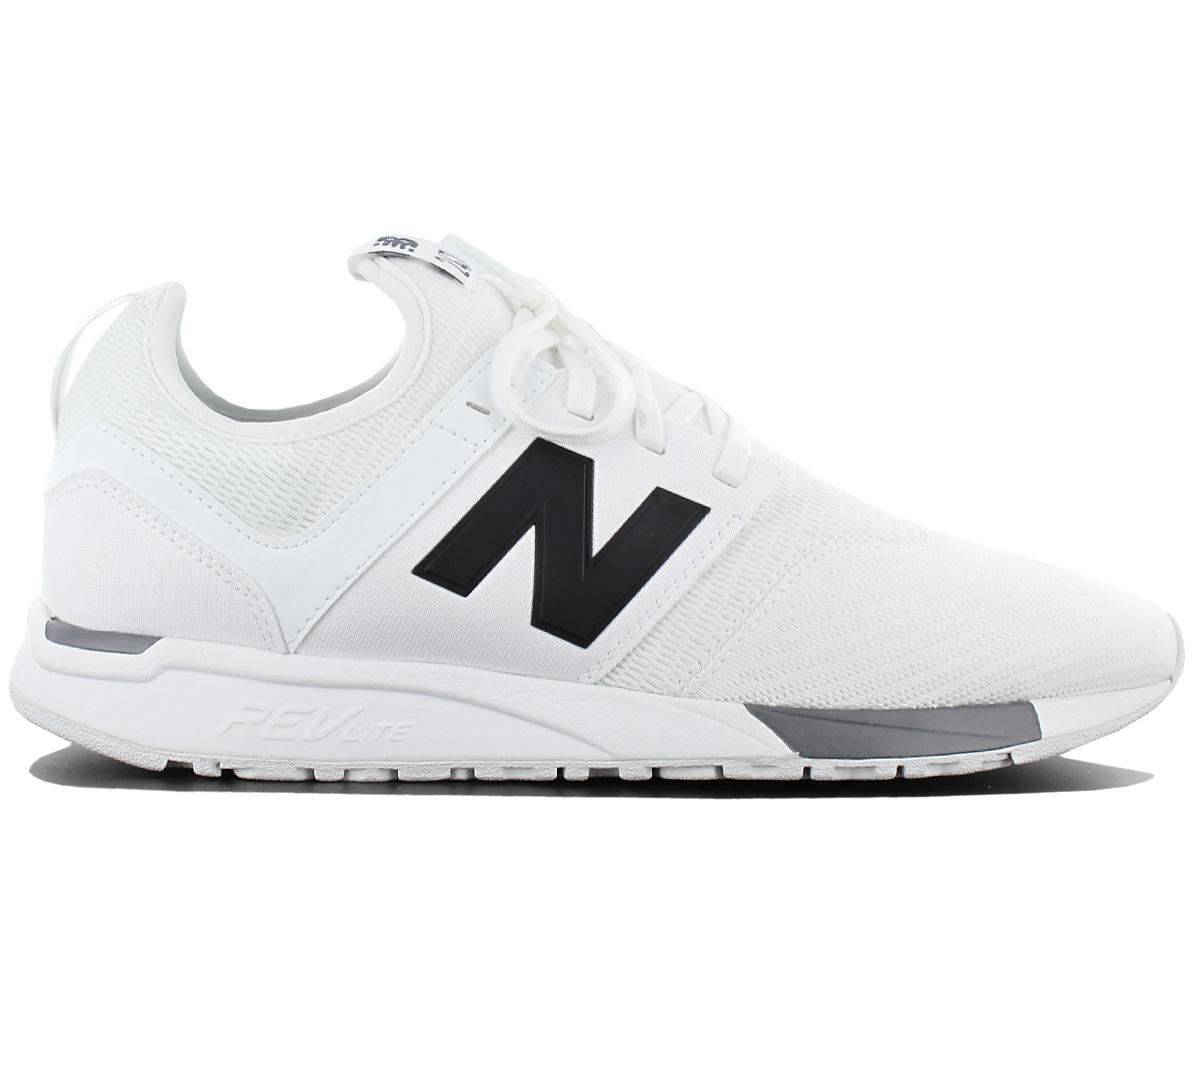 New Balance Herren Sneaker Schuhe Freizeit Turnschuhe 420 247 373 500 446 410 NB